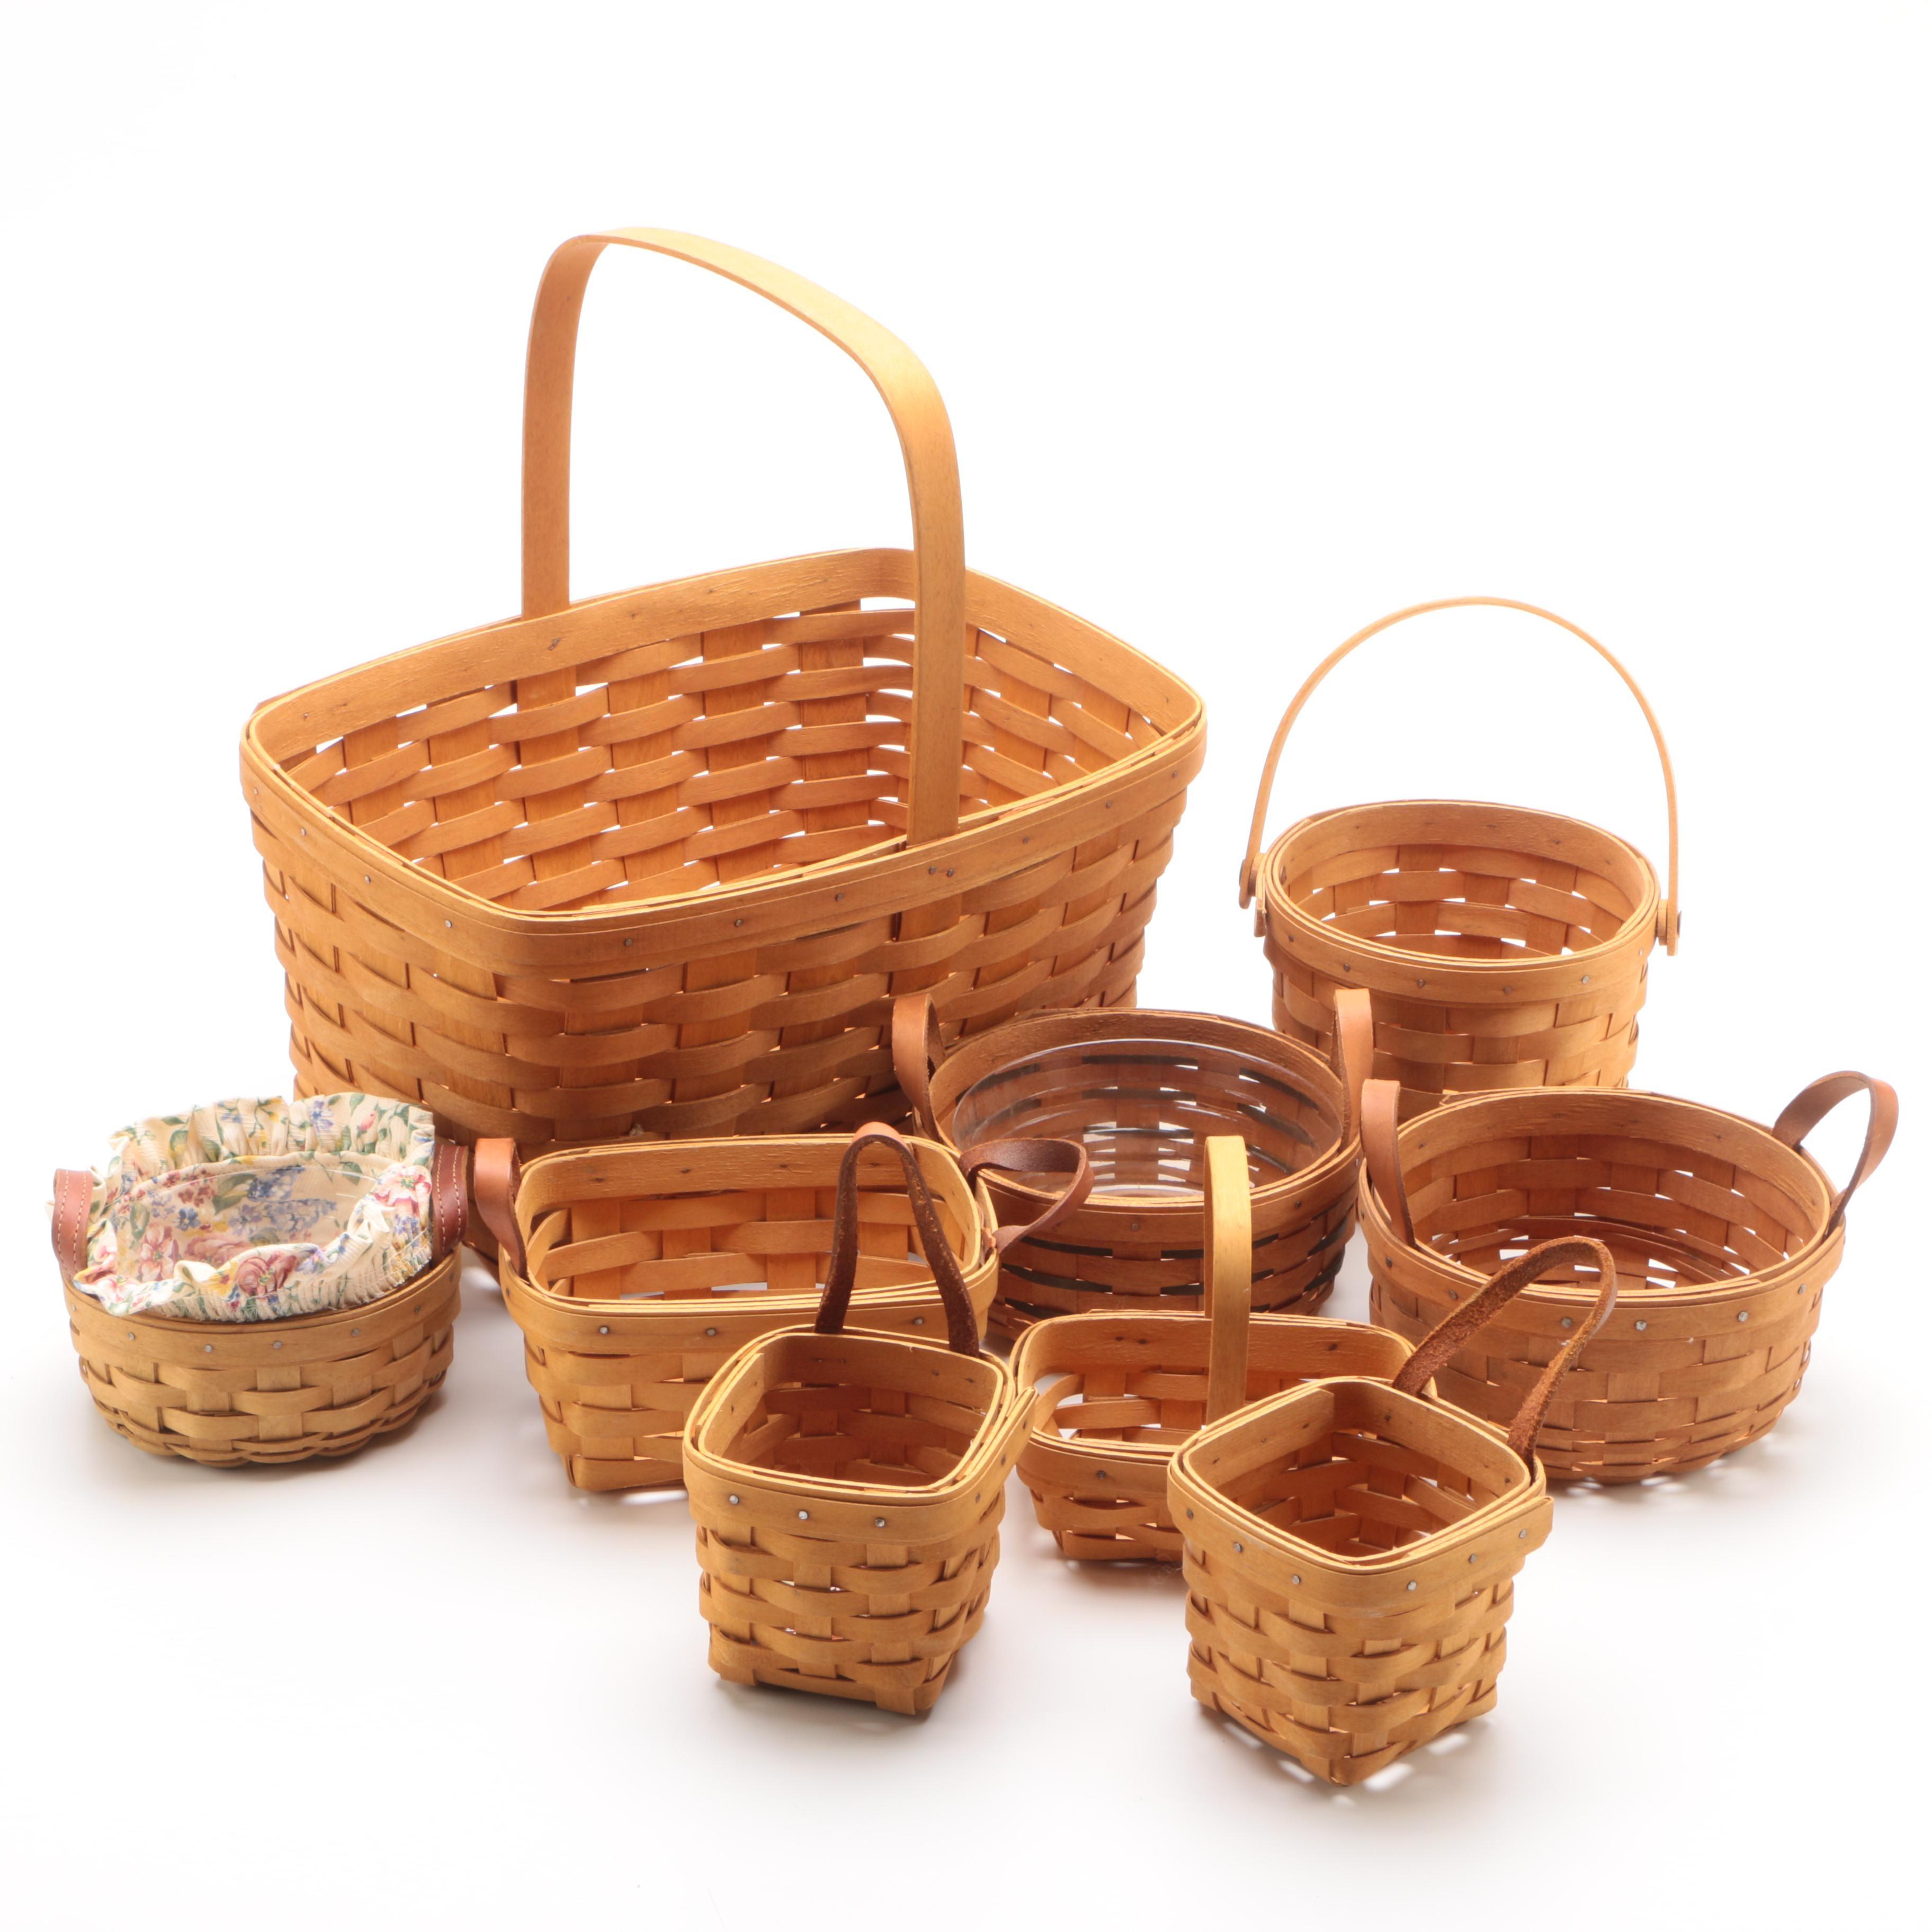 Longaberger Handled Baskets, 1993-2004